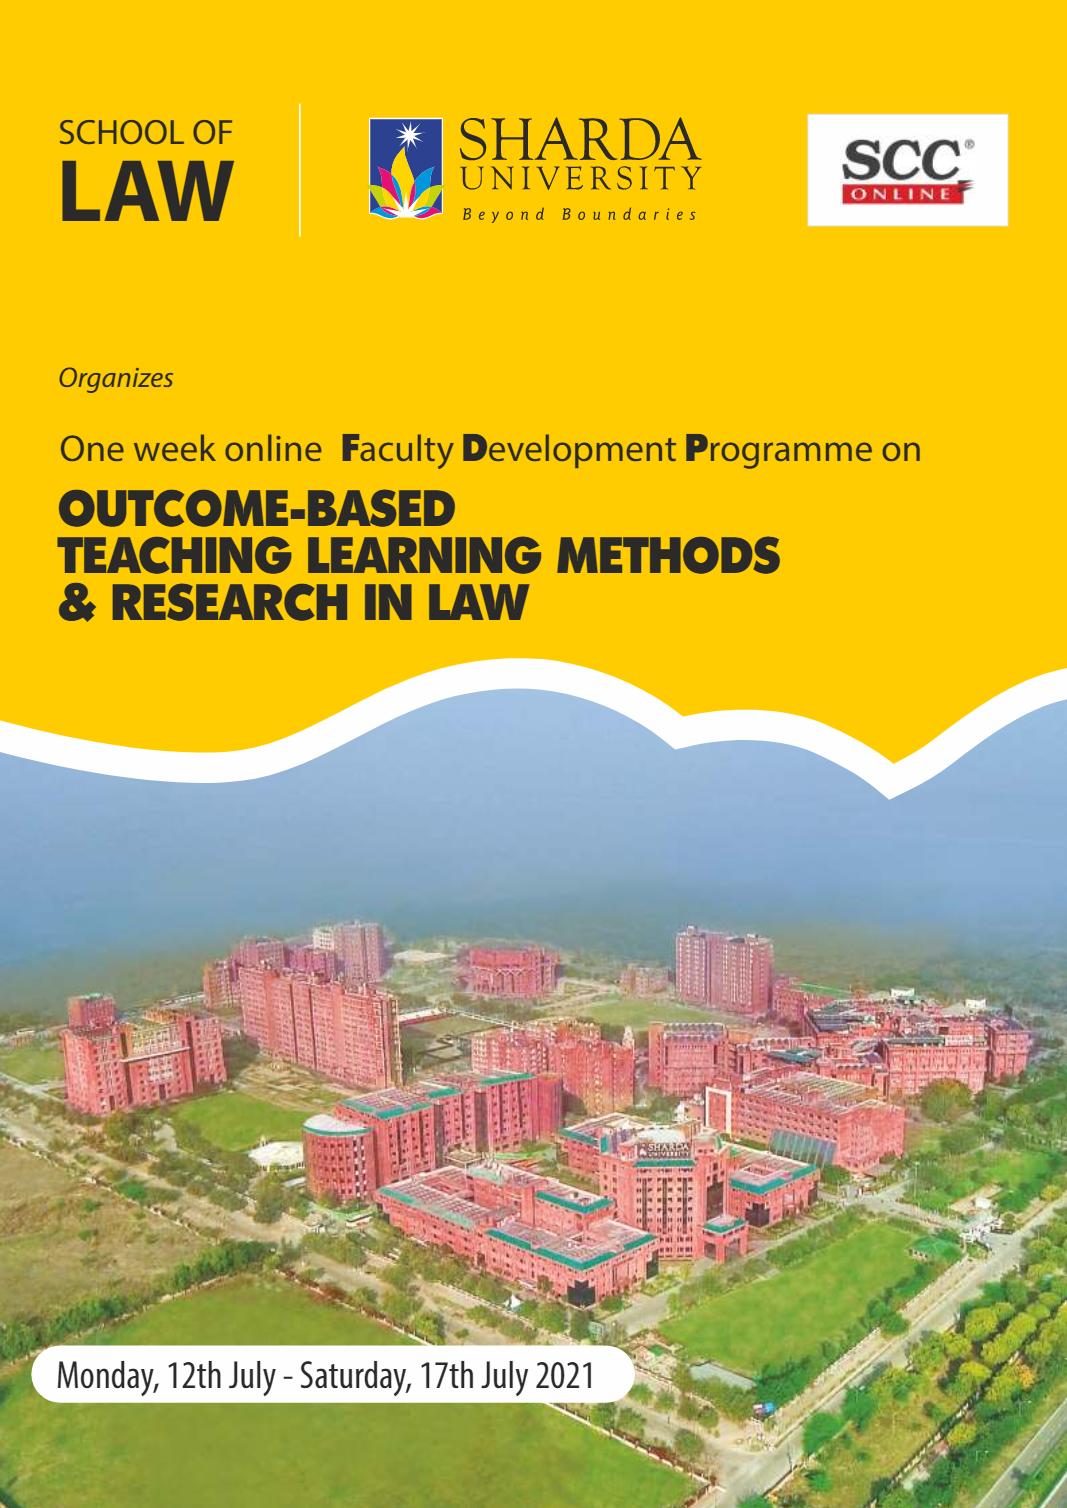 Online Faculty Development Programme at Sharda University: Register Now.